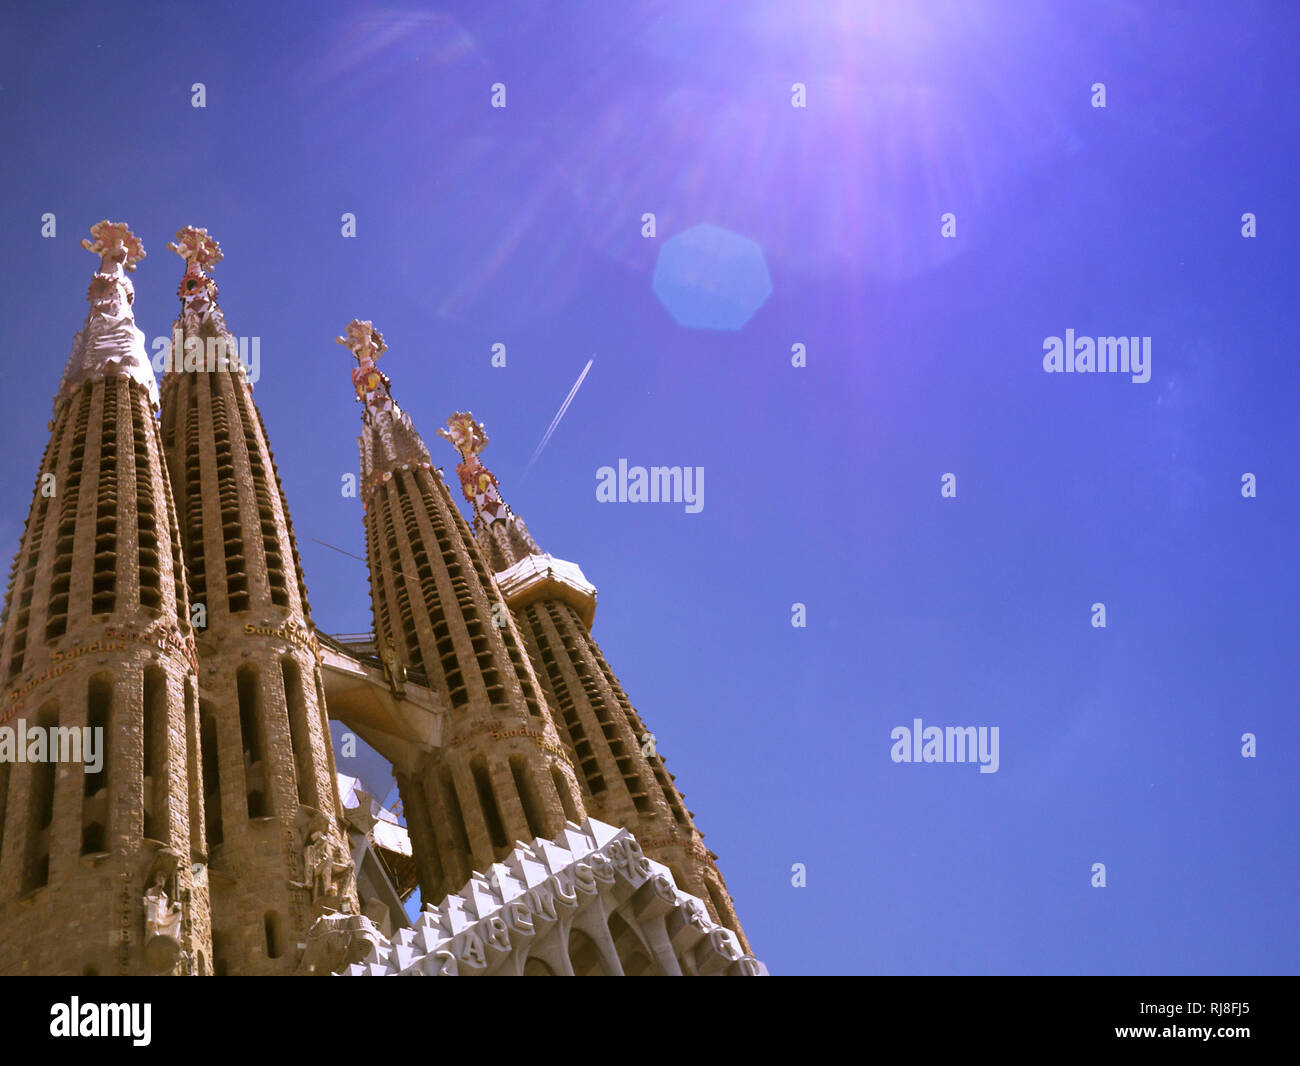 Sagrada Familia, Detail, Türme, blauer Himmel - Stock Image